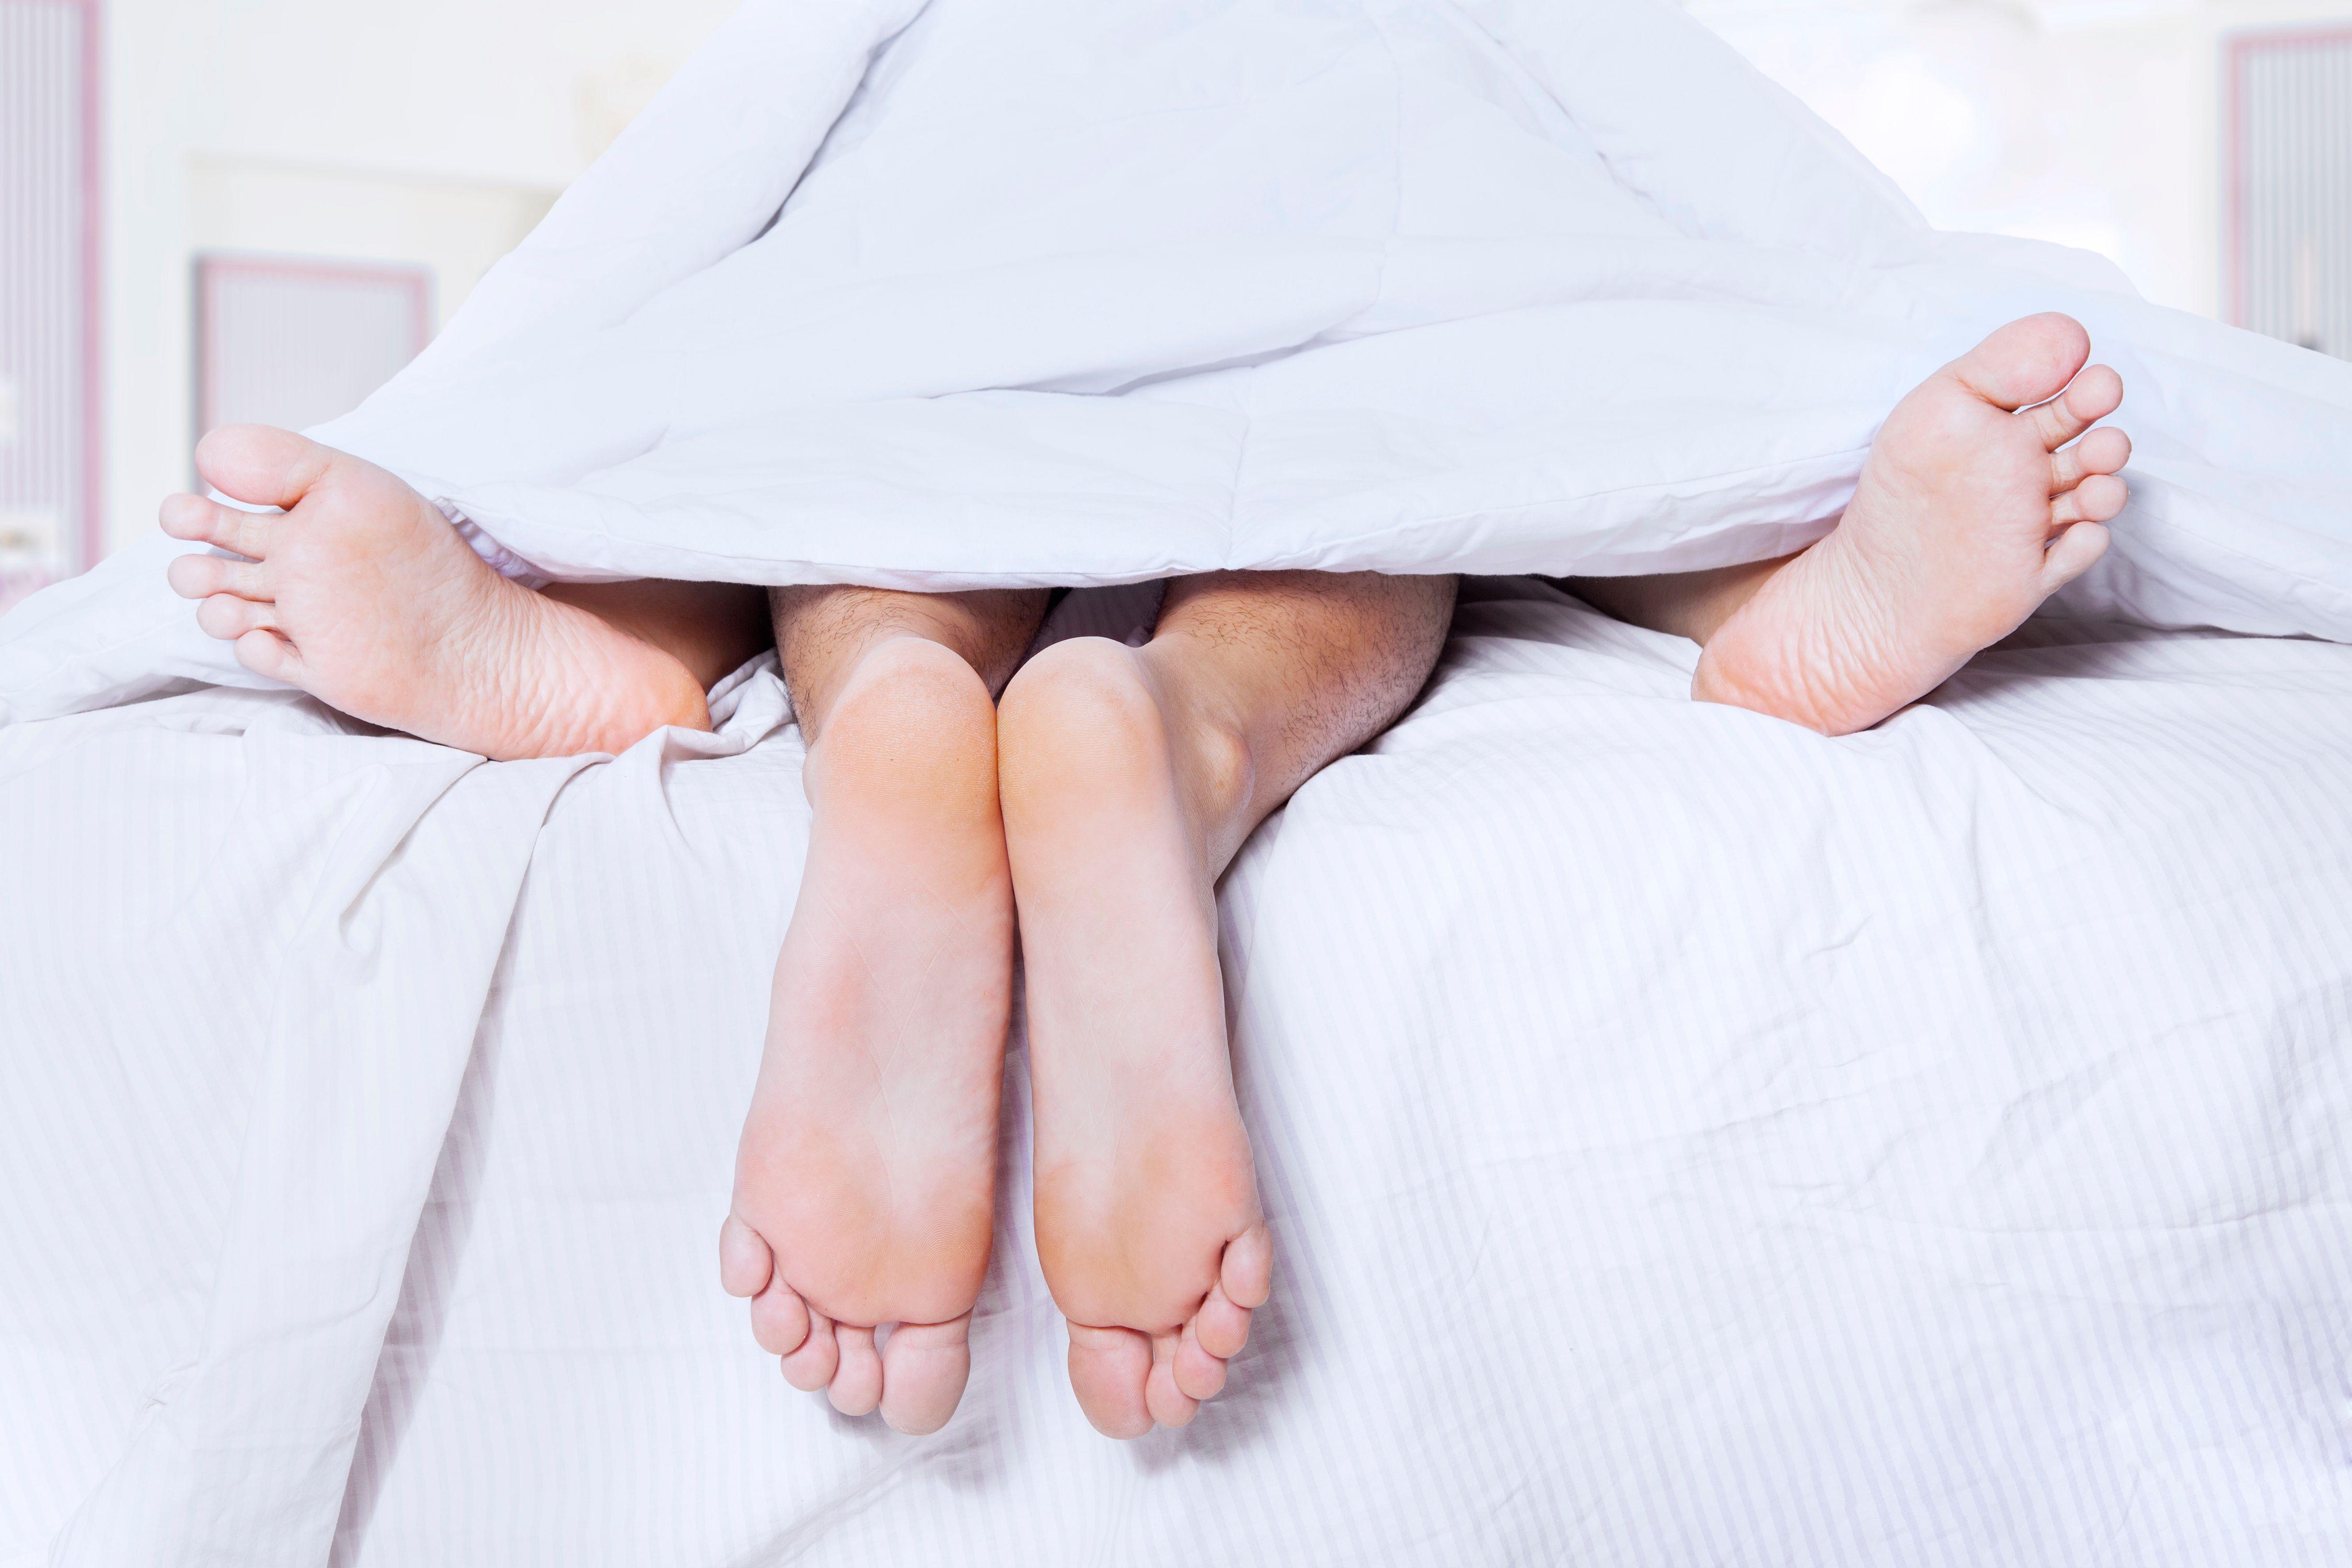 Sleeping celebs getting fucked